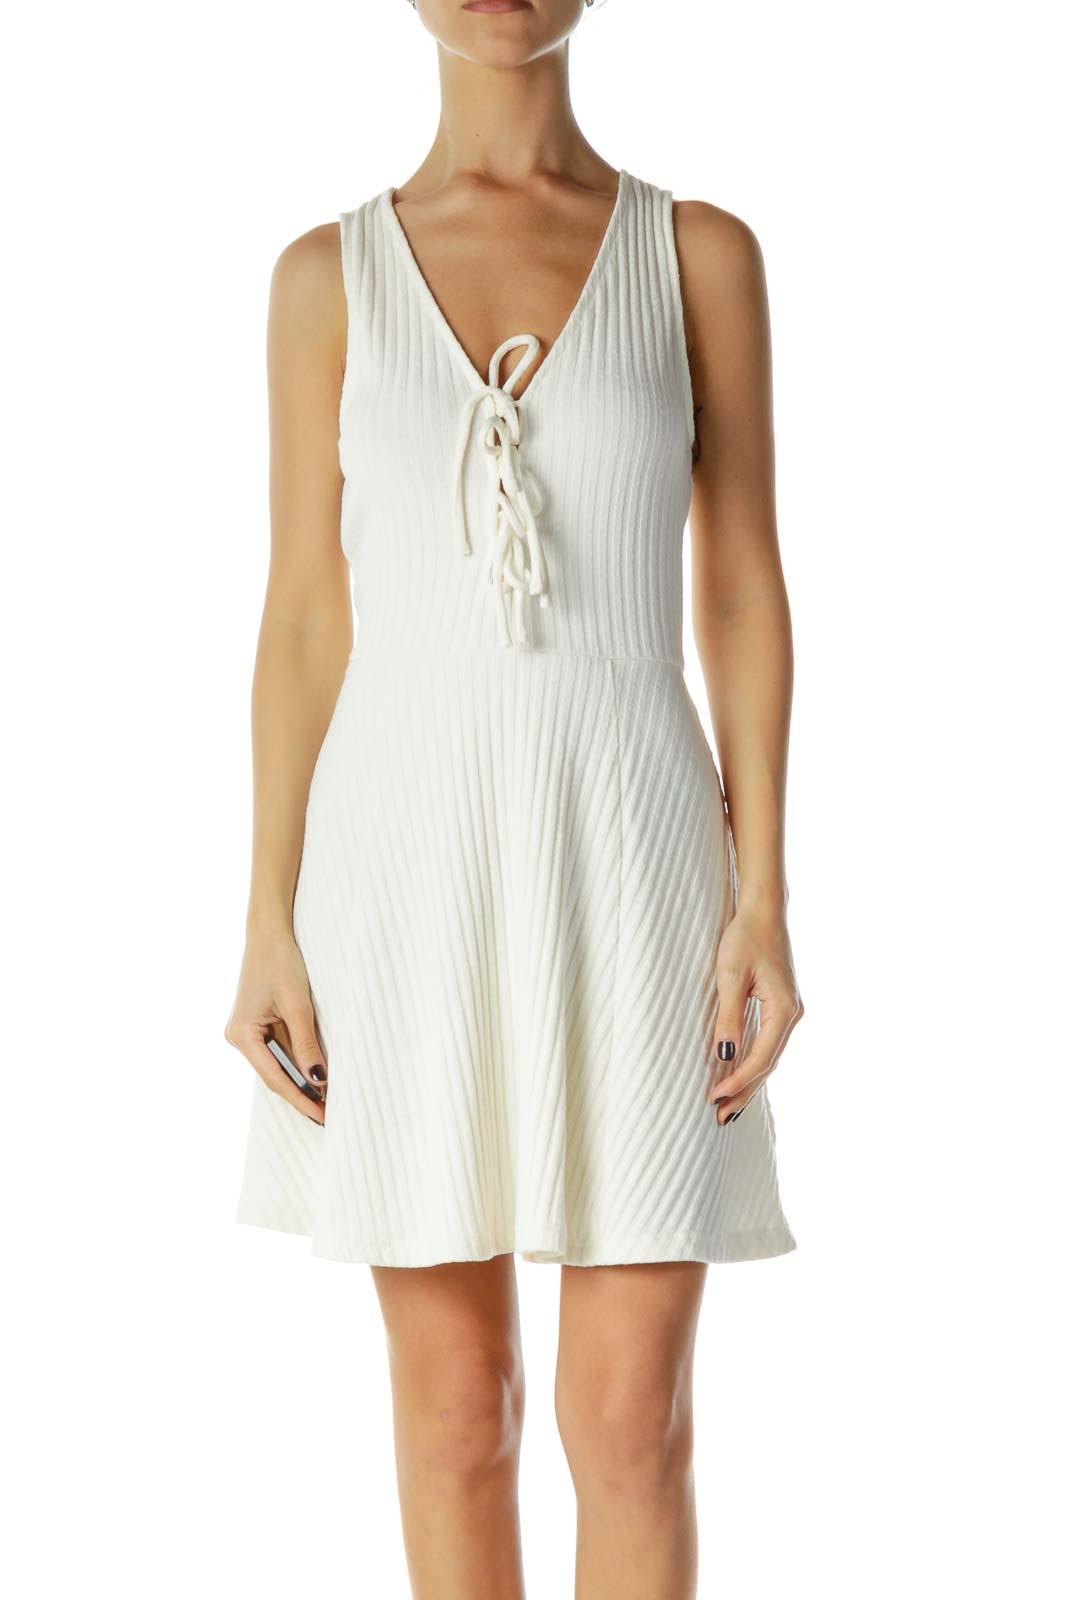 Cream Knit Racerback Day Dress